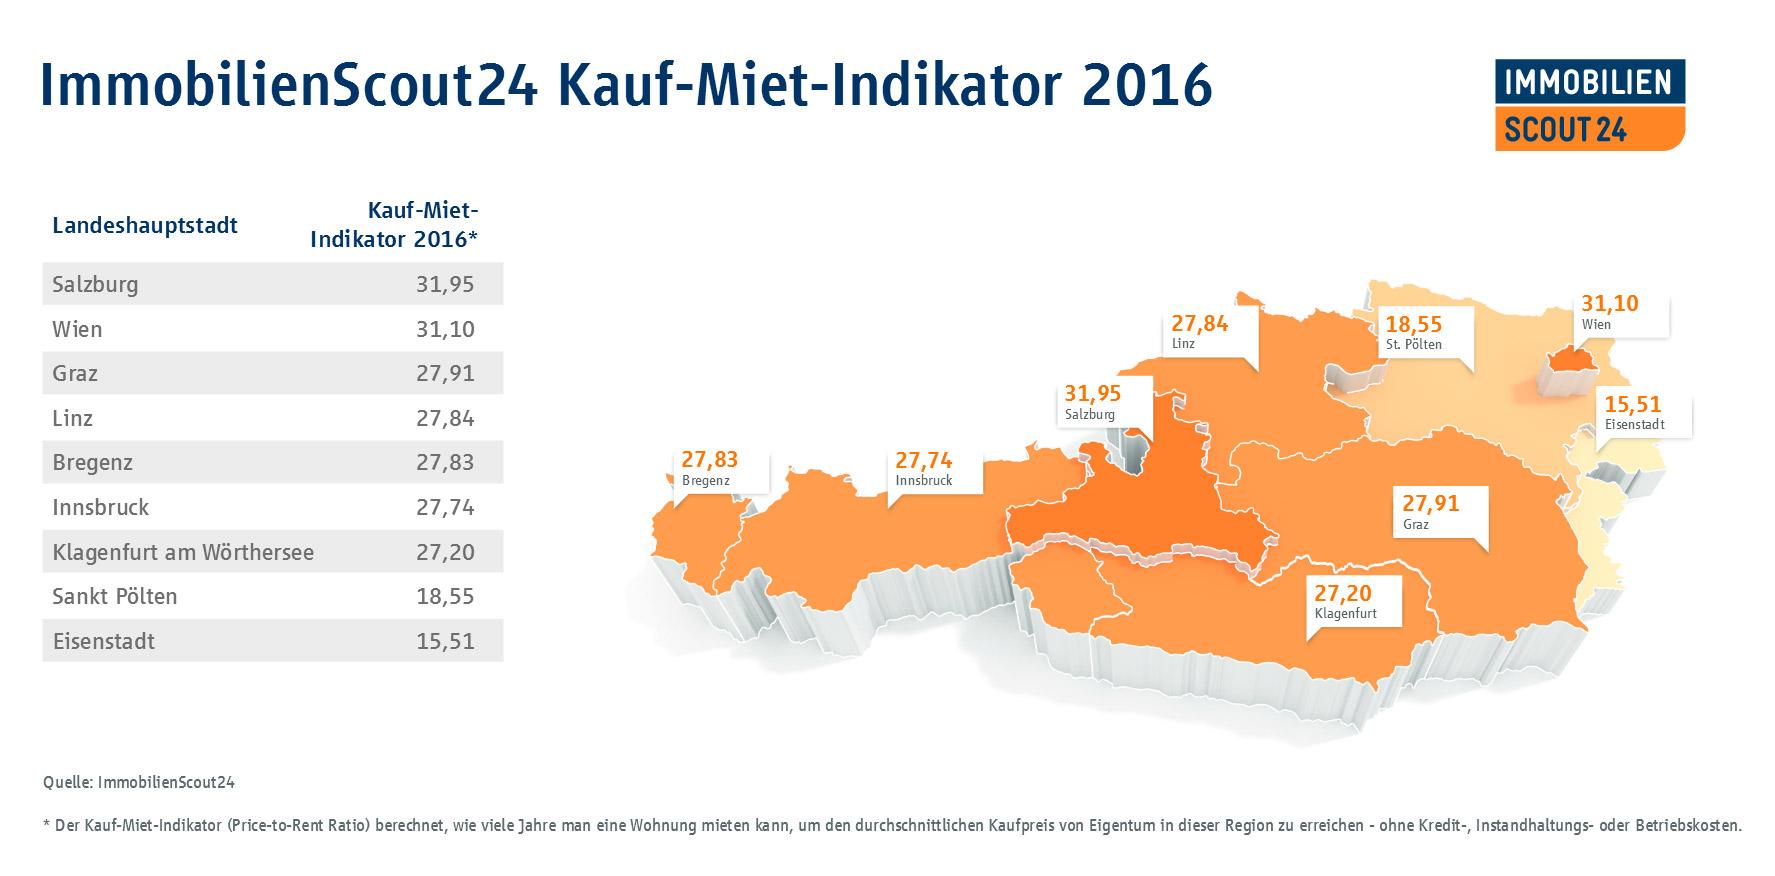 Price-To-Rent Ratio Österreichkarte